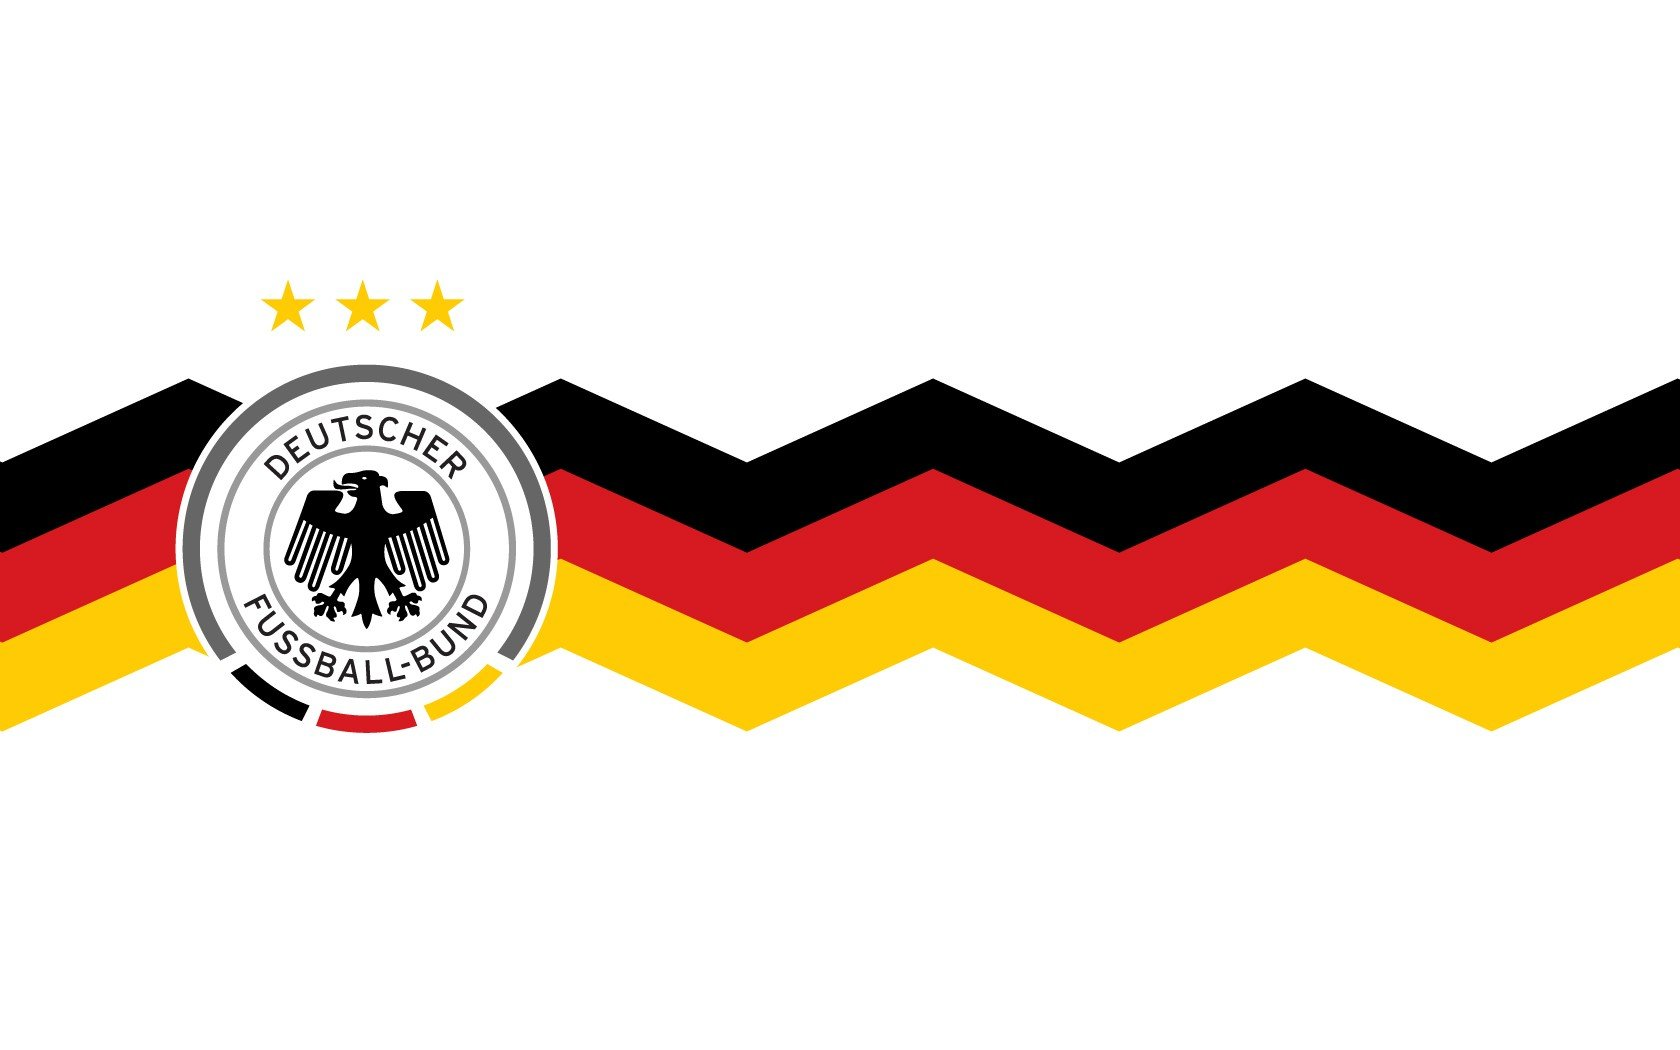 germany logo wallpaper - photo #12